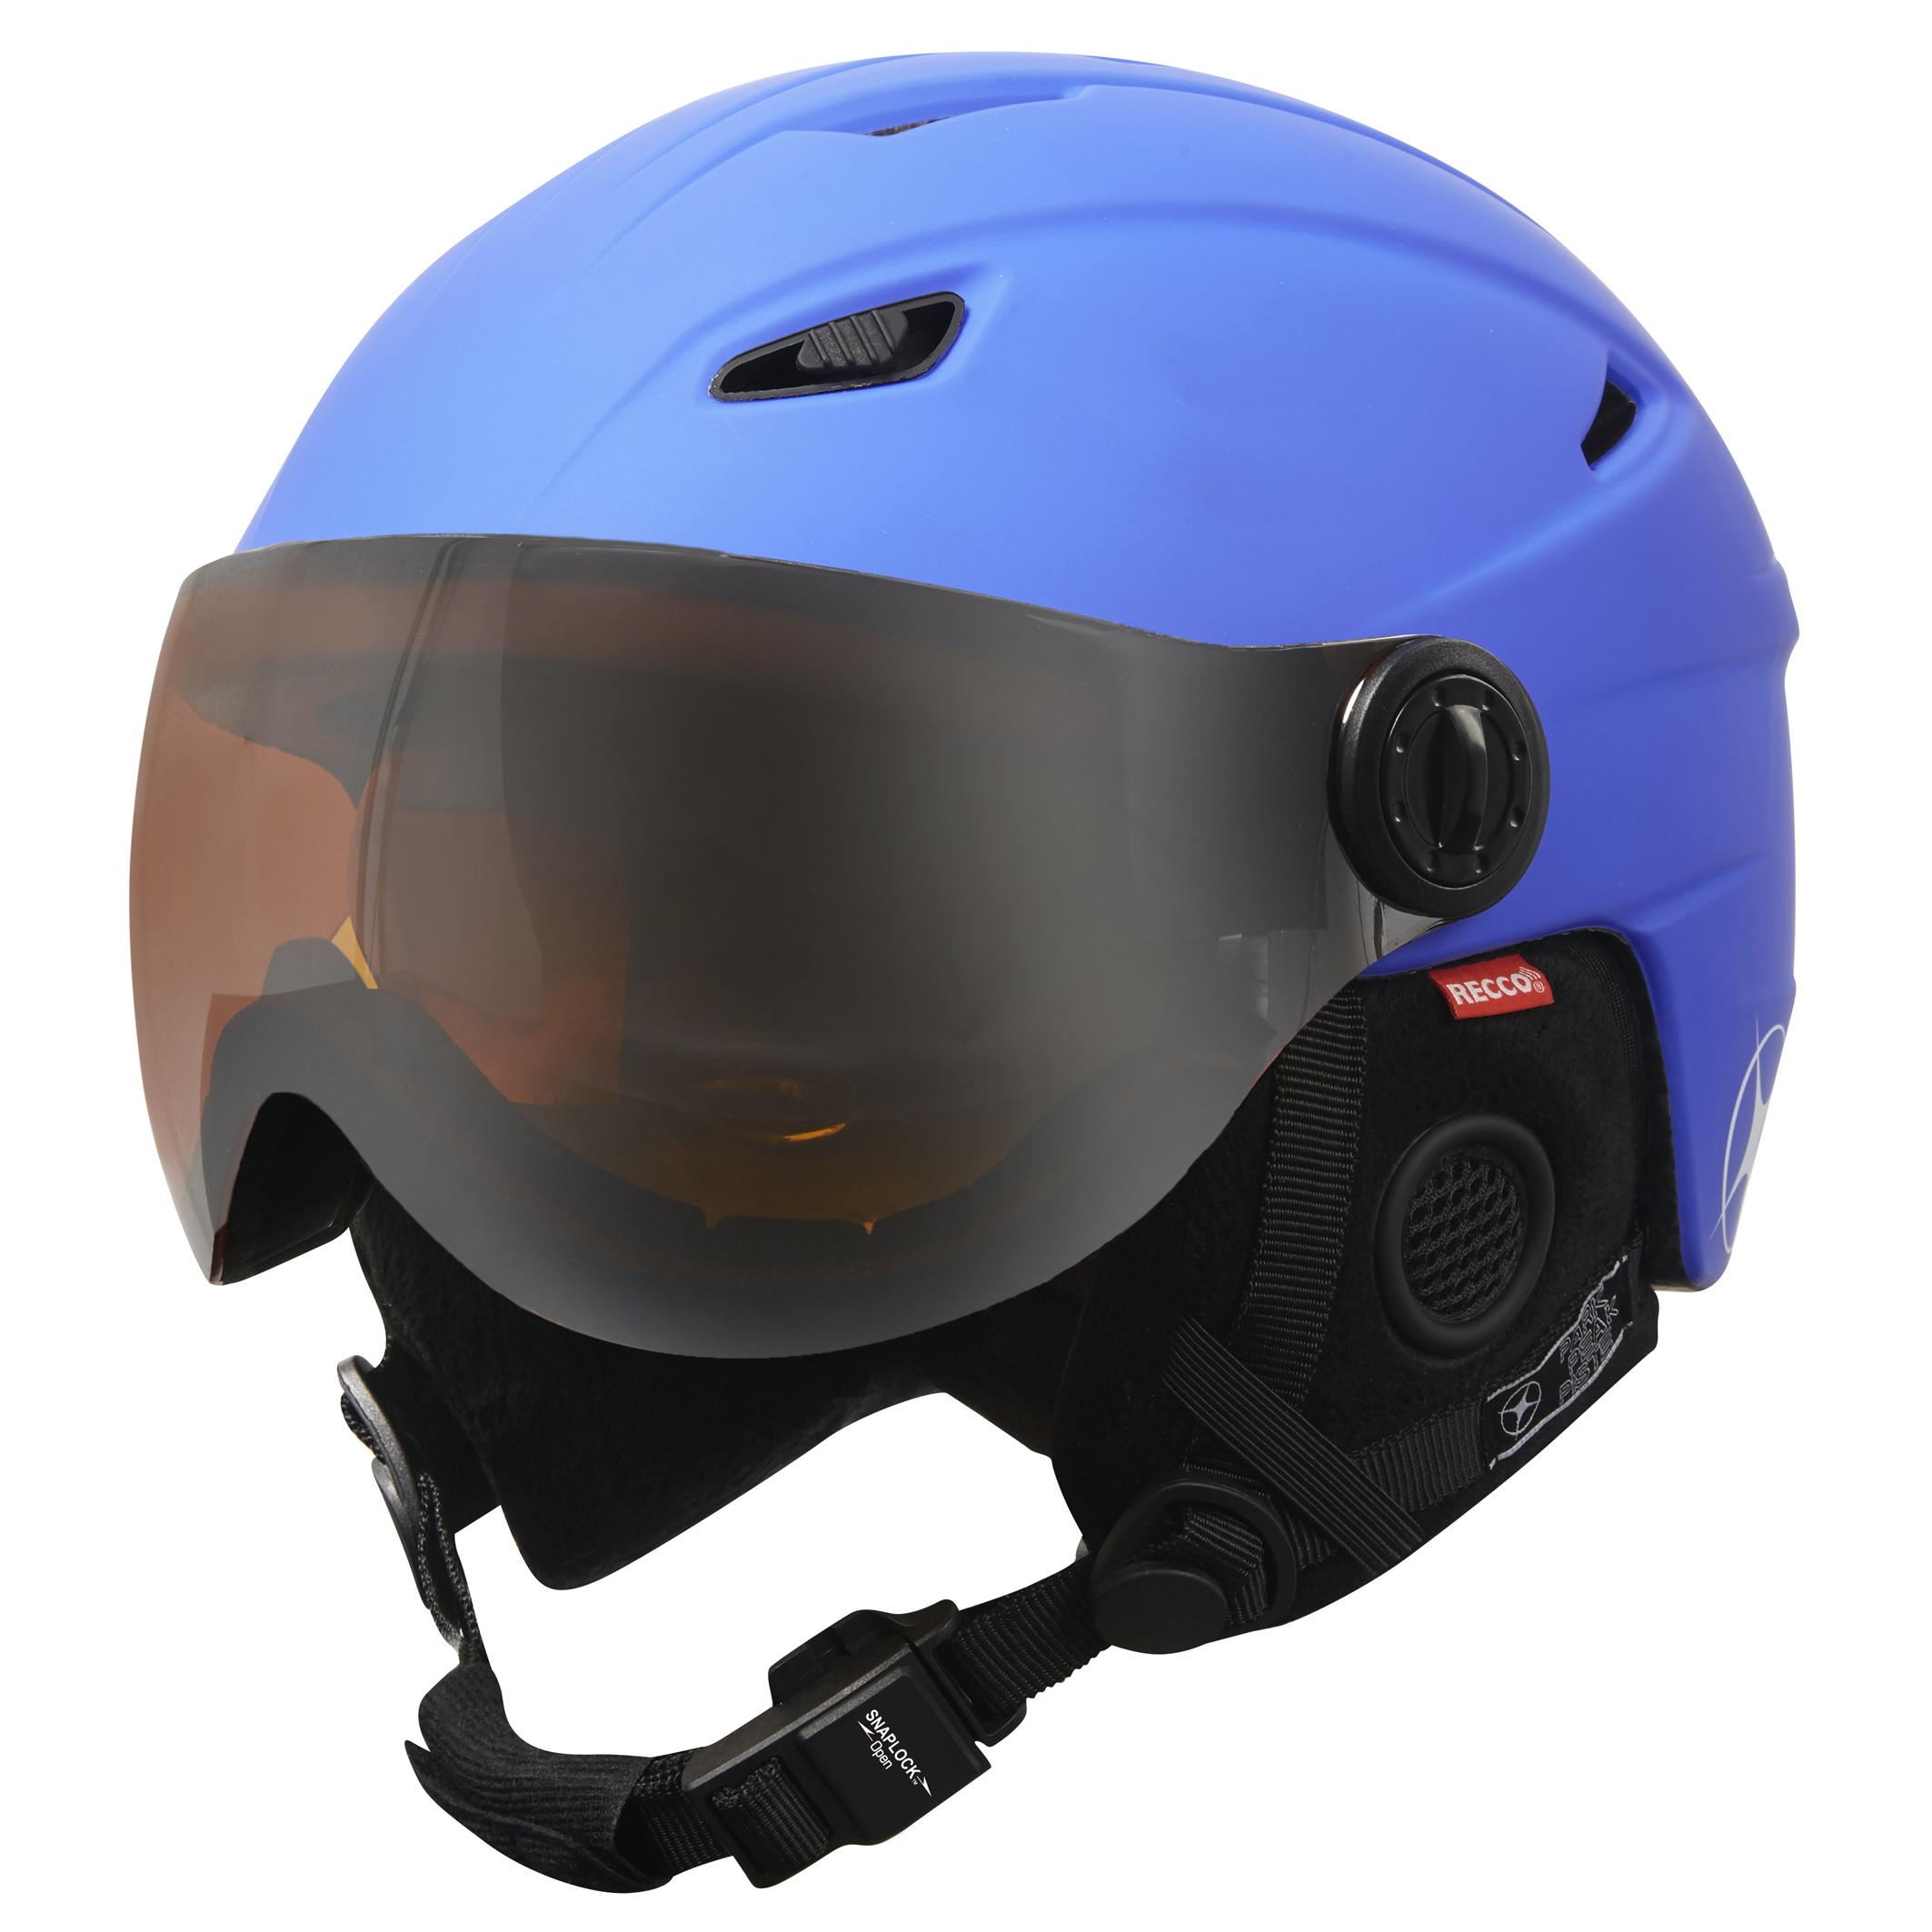 db3f453ee478 Manbi park visor kids ski helmet review the whiteroom jpg 2126x2126 Manbi  ski strap